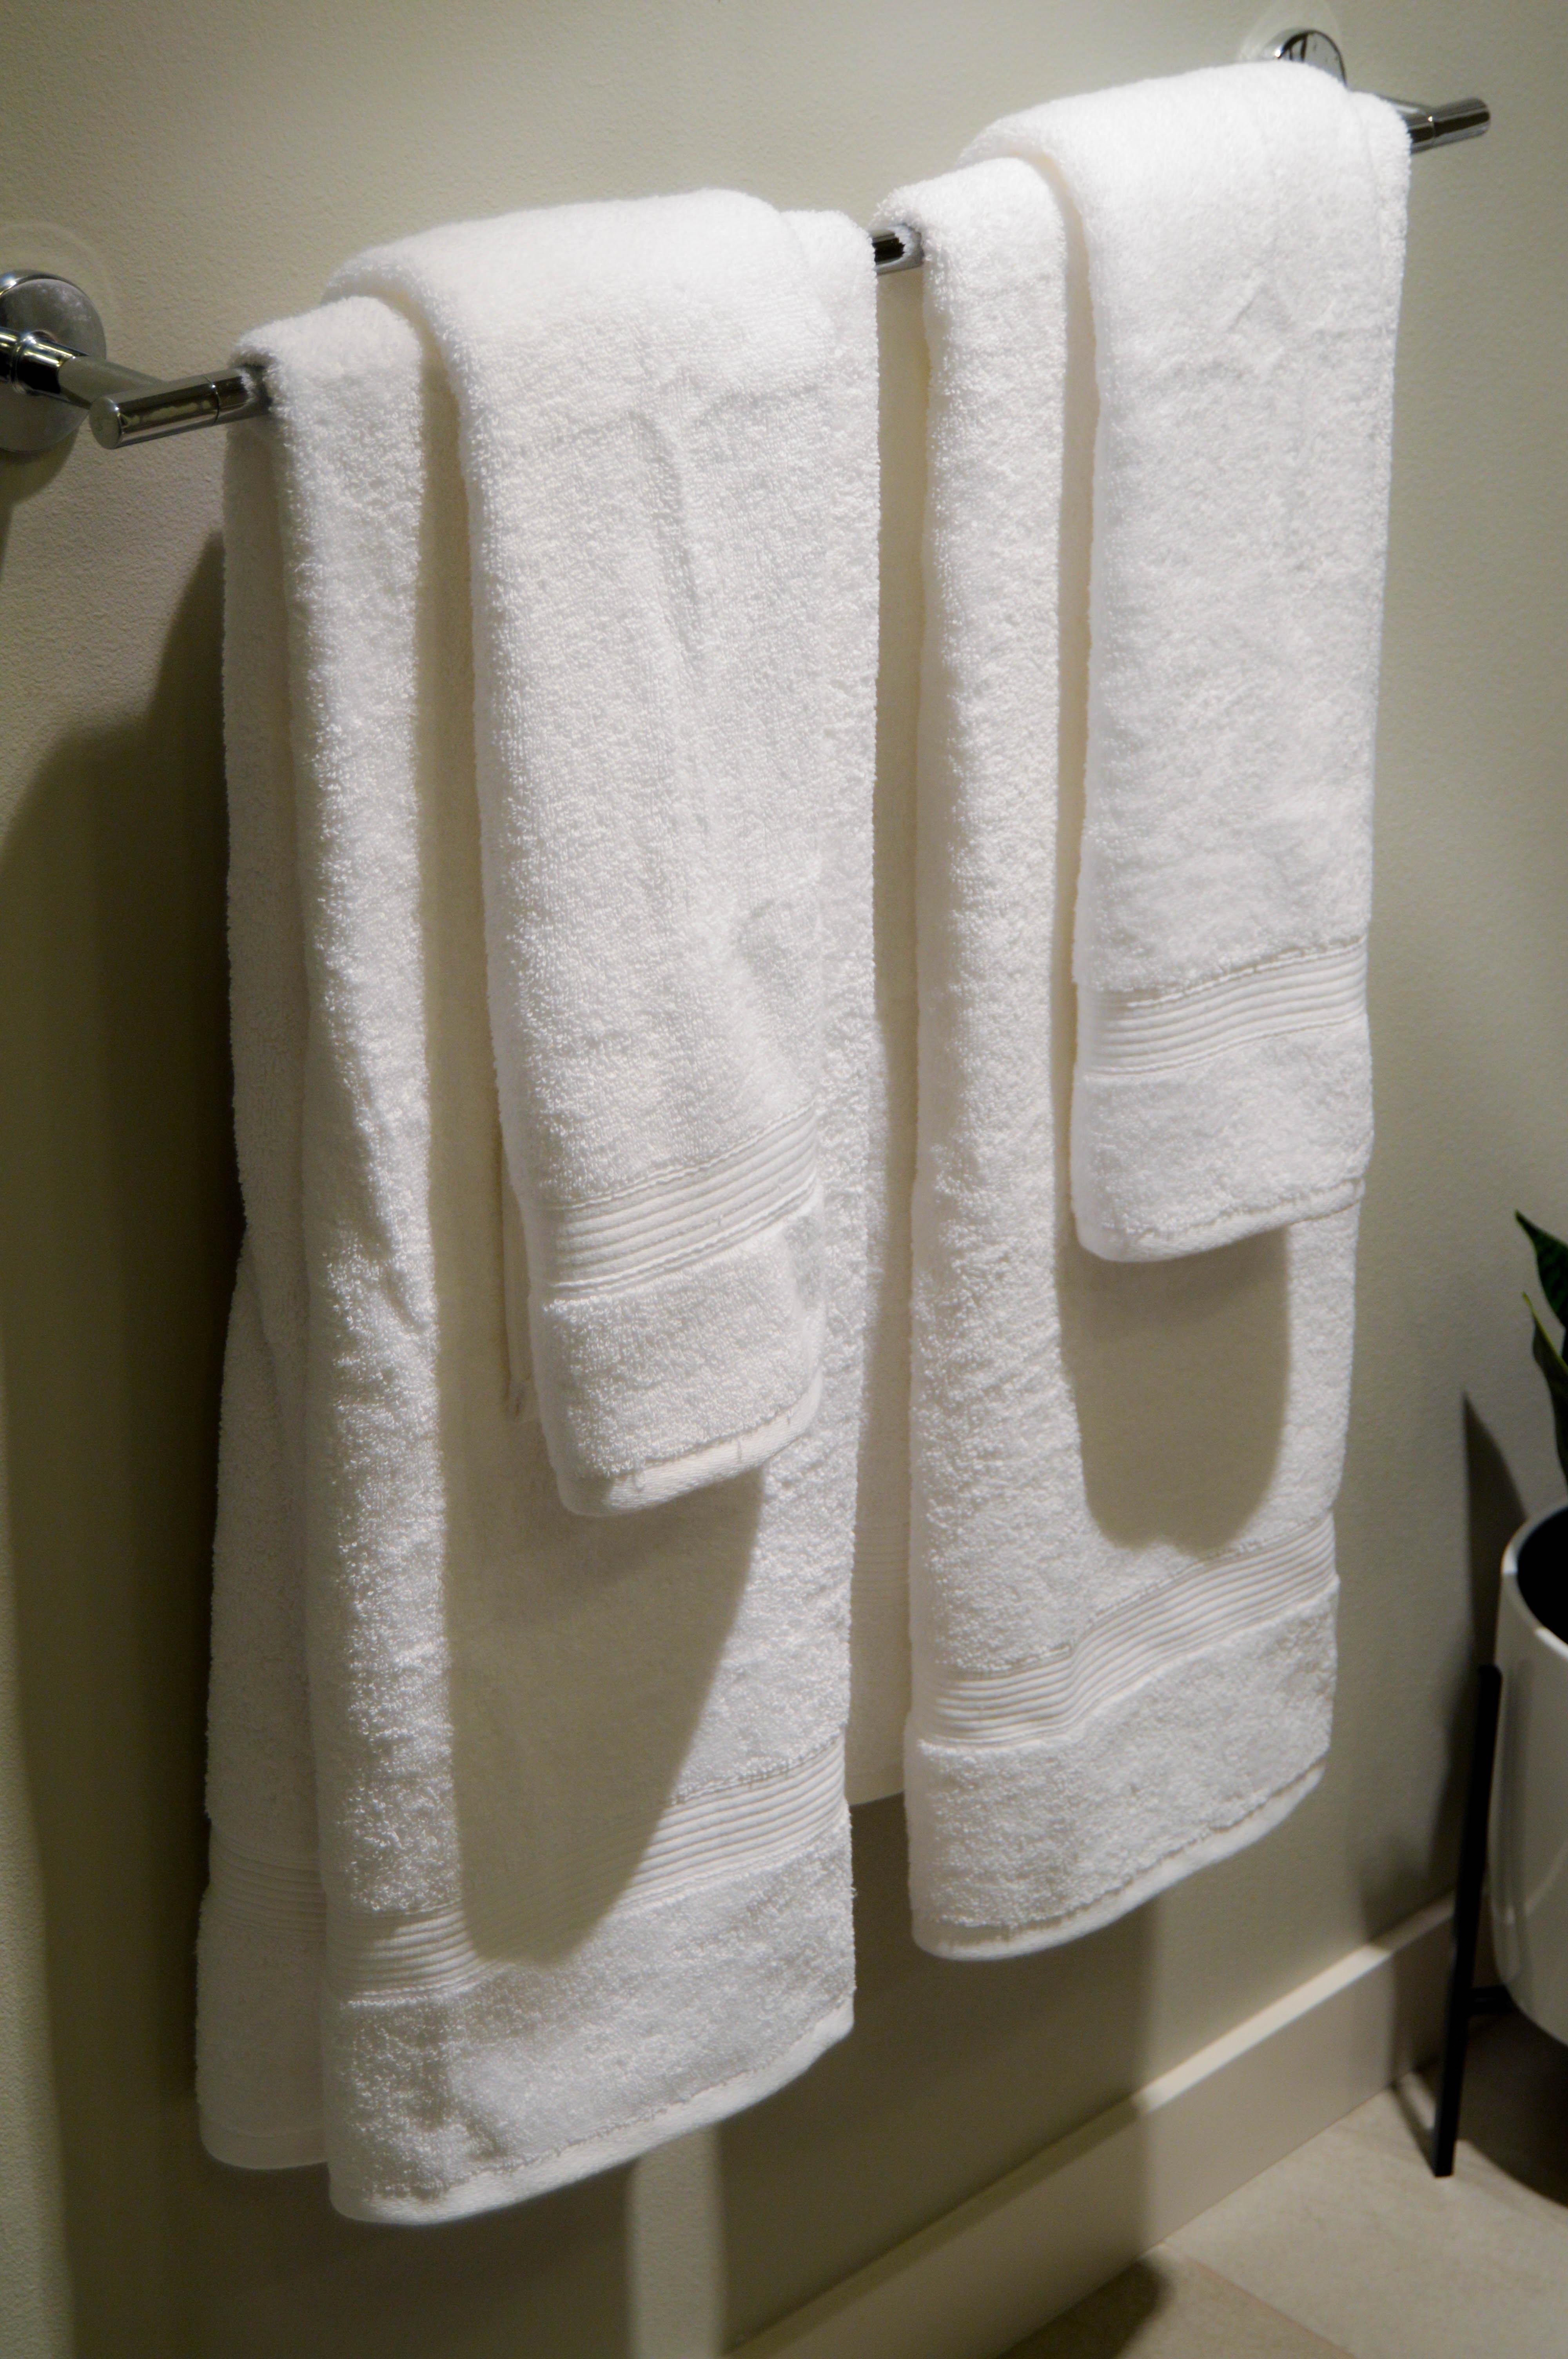 White towels: Bathroom Summer Refresh